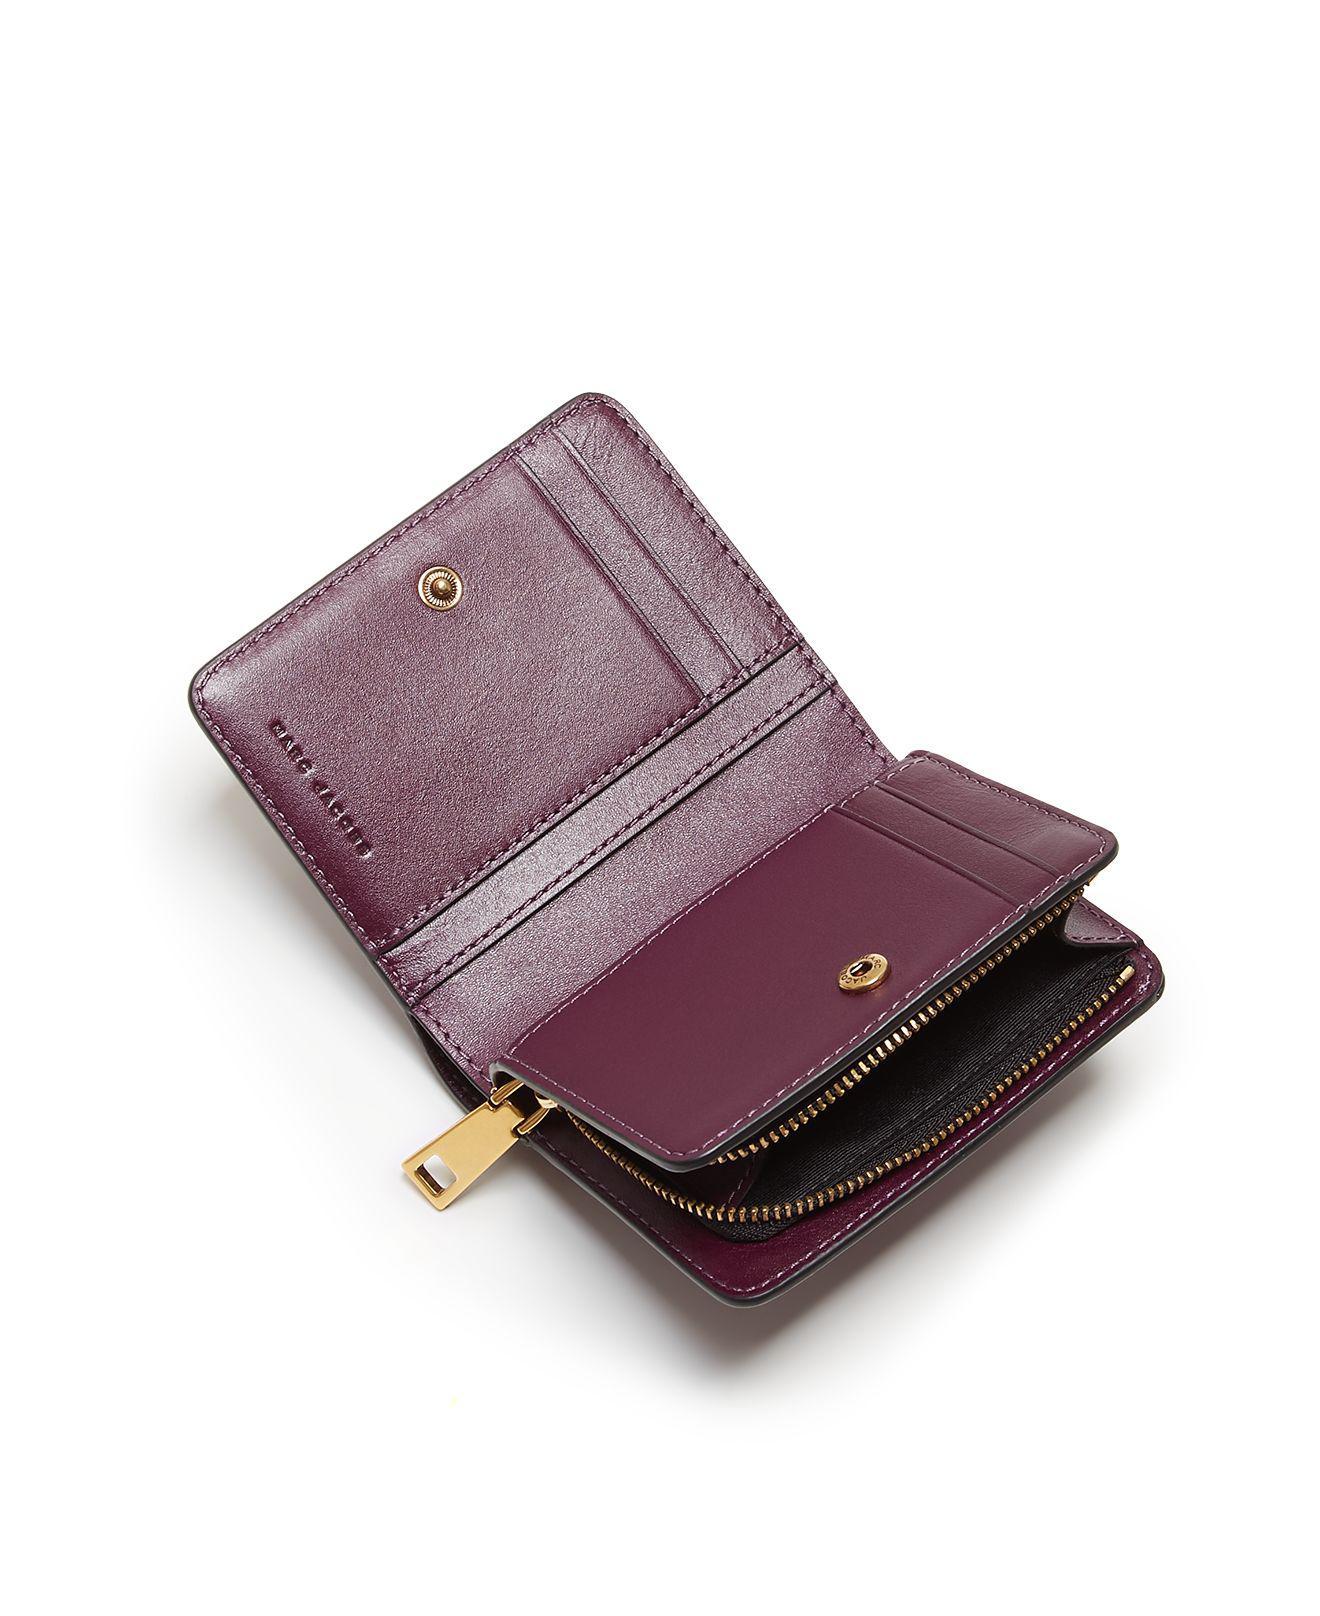 Marc Jacobs Gotham mini compact wallet vF6ojk